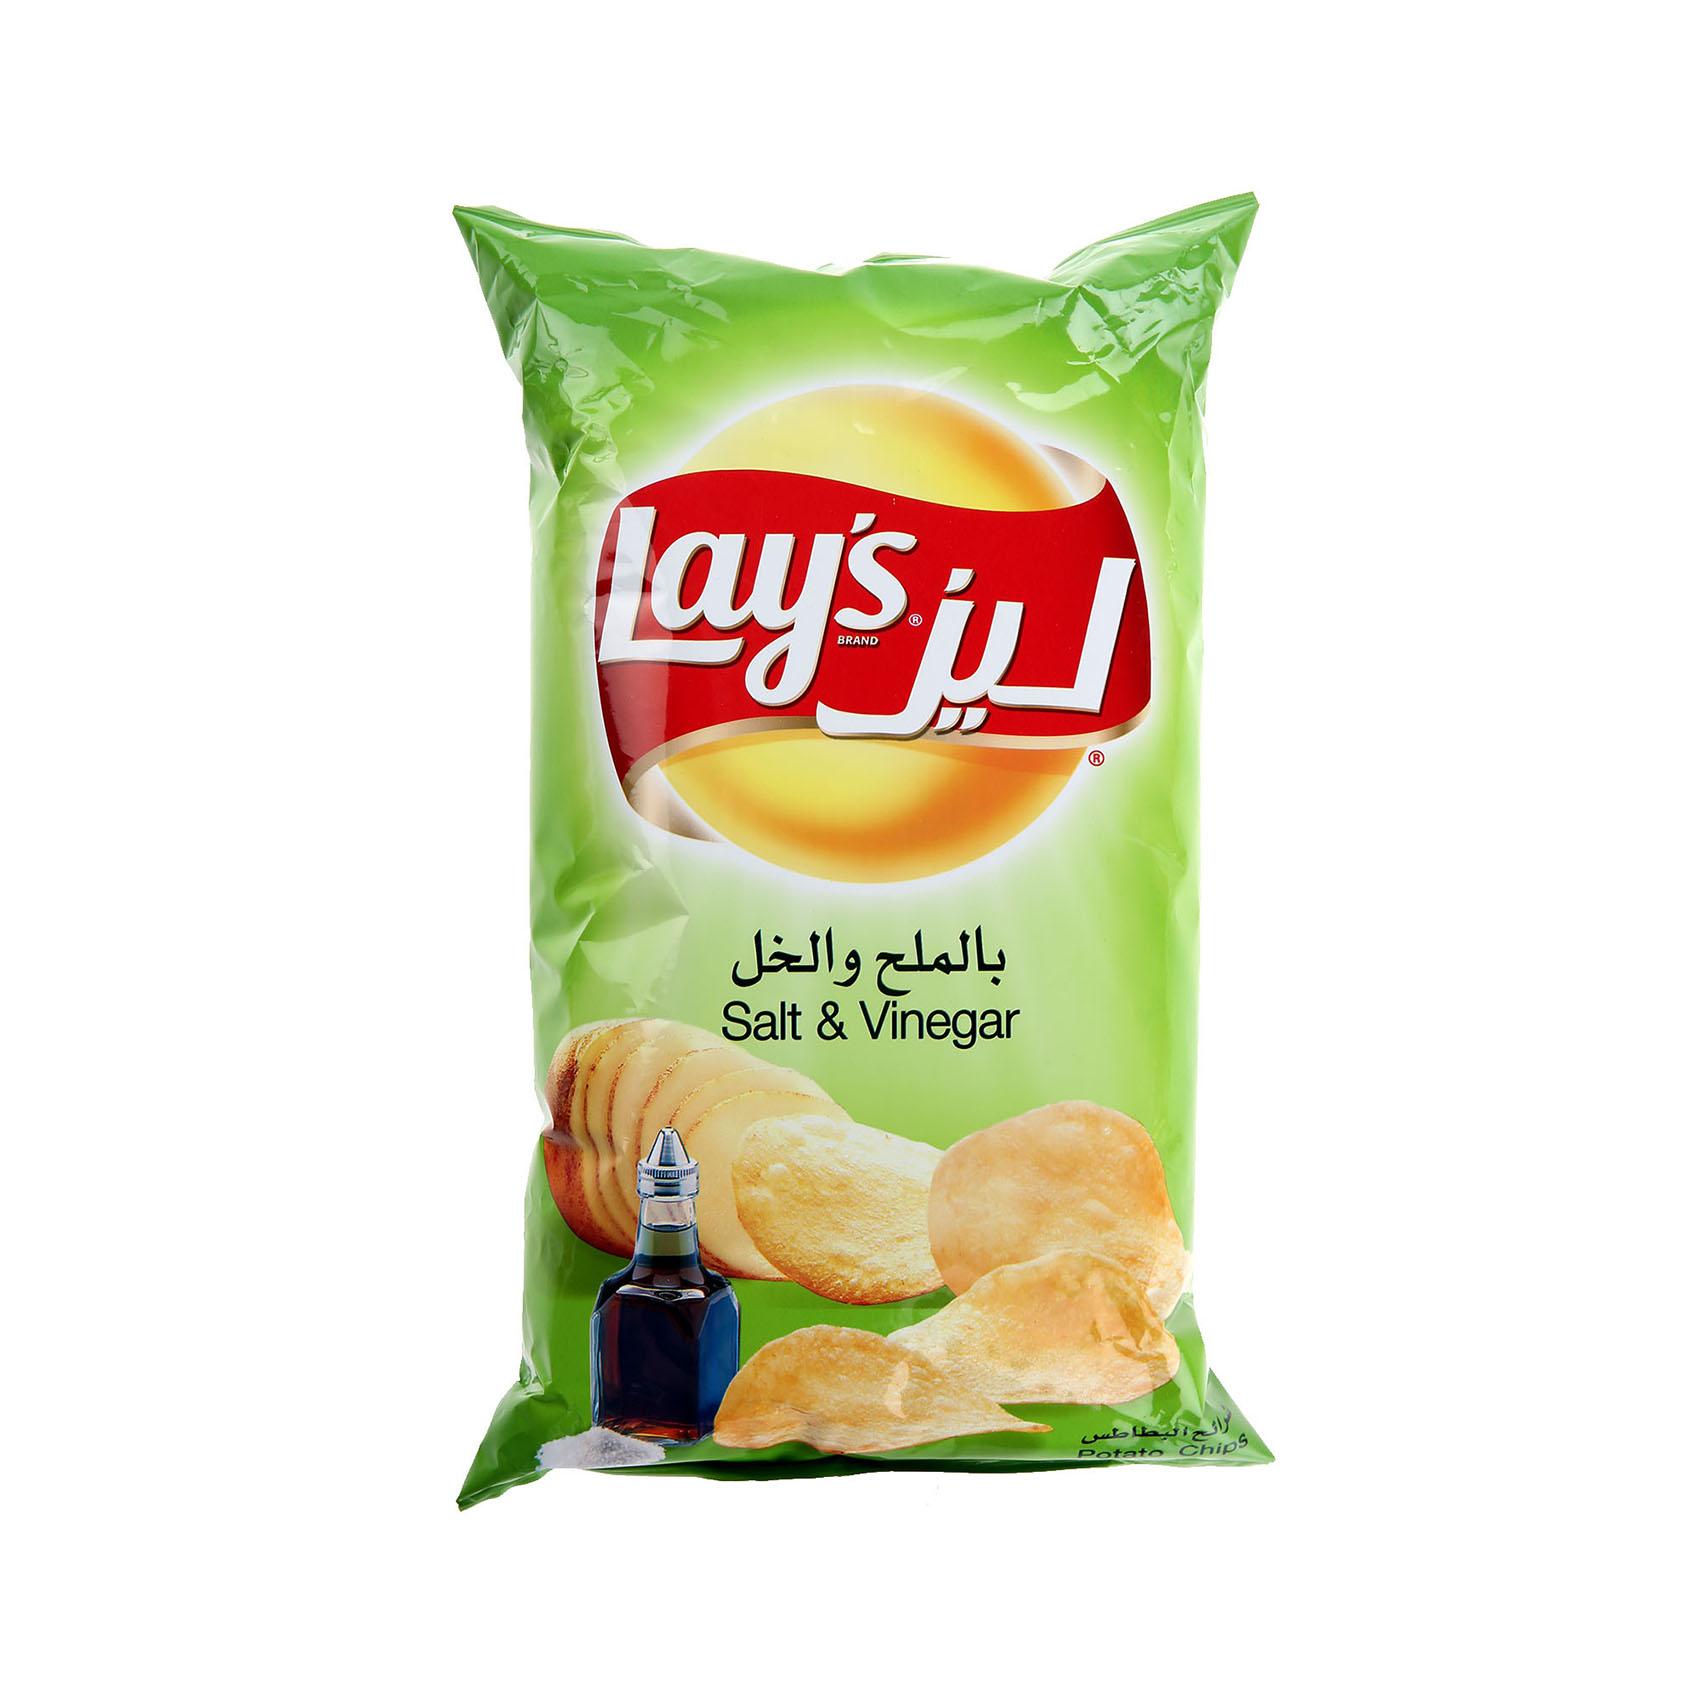 LAY'S CHIPS SALT AND VINEGAR 170G